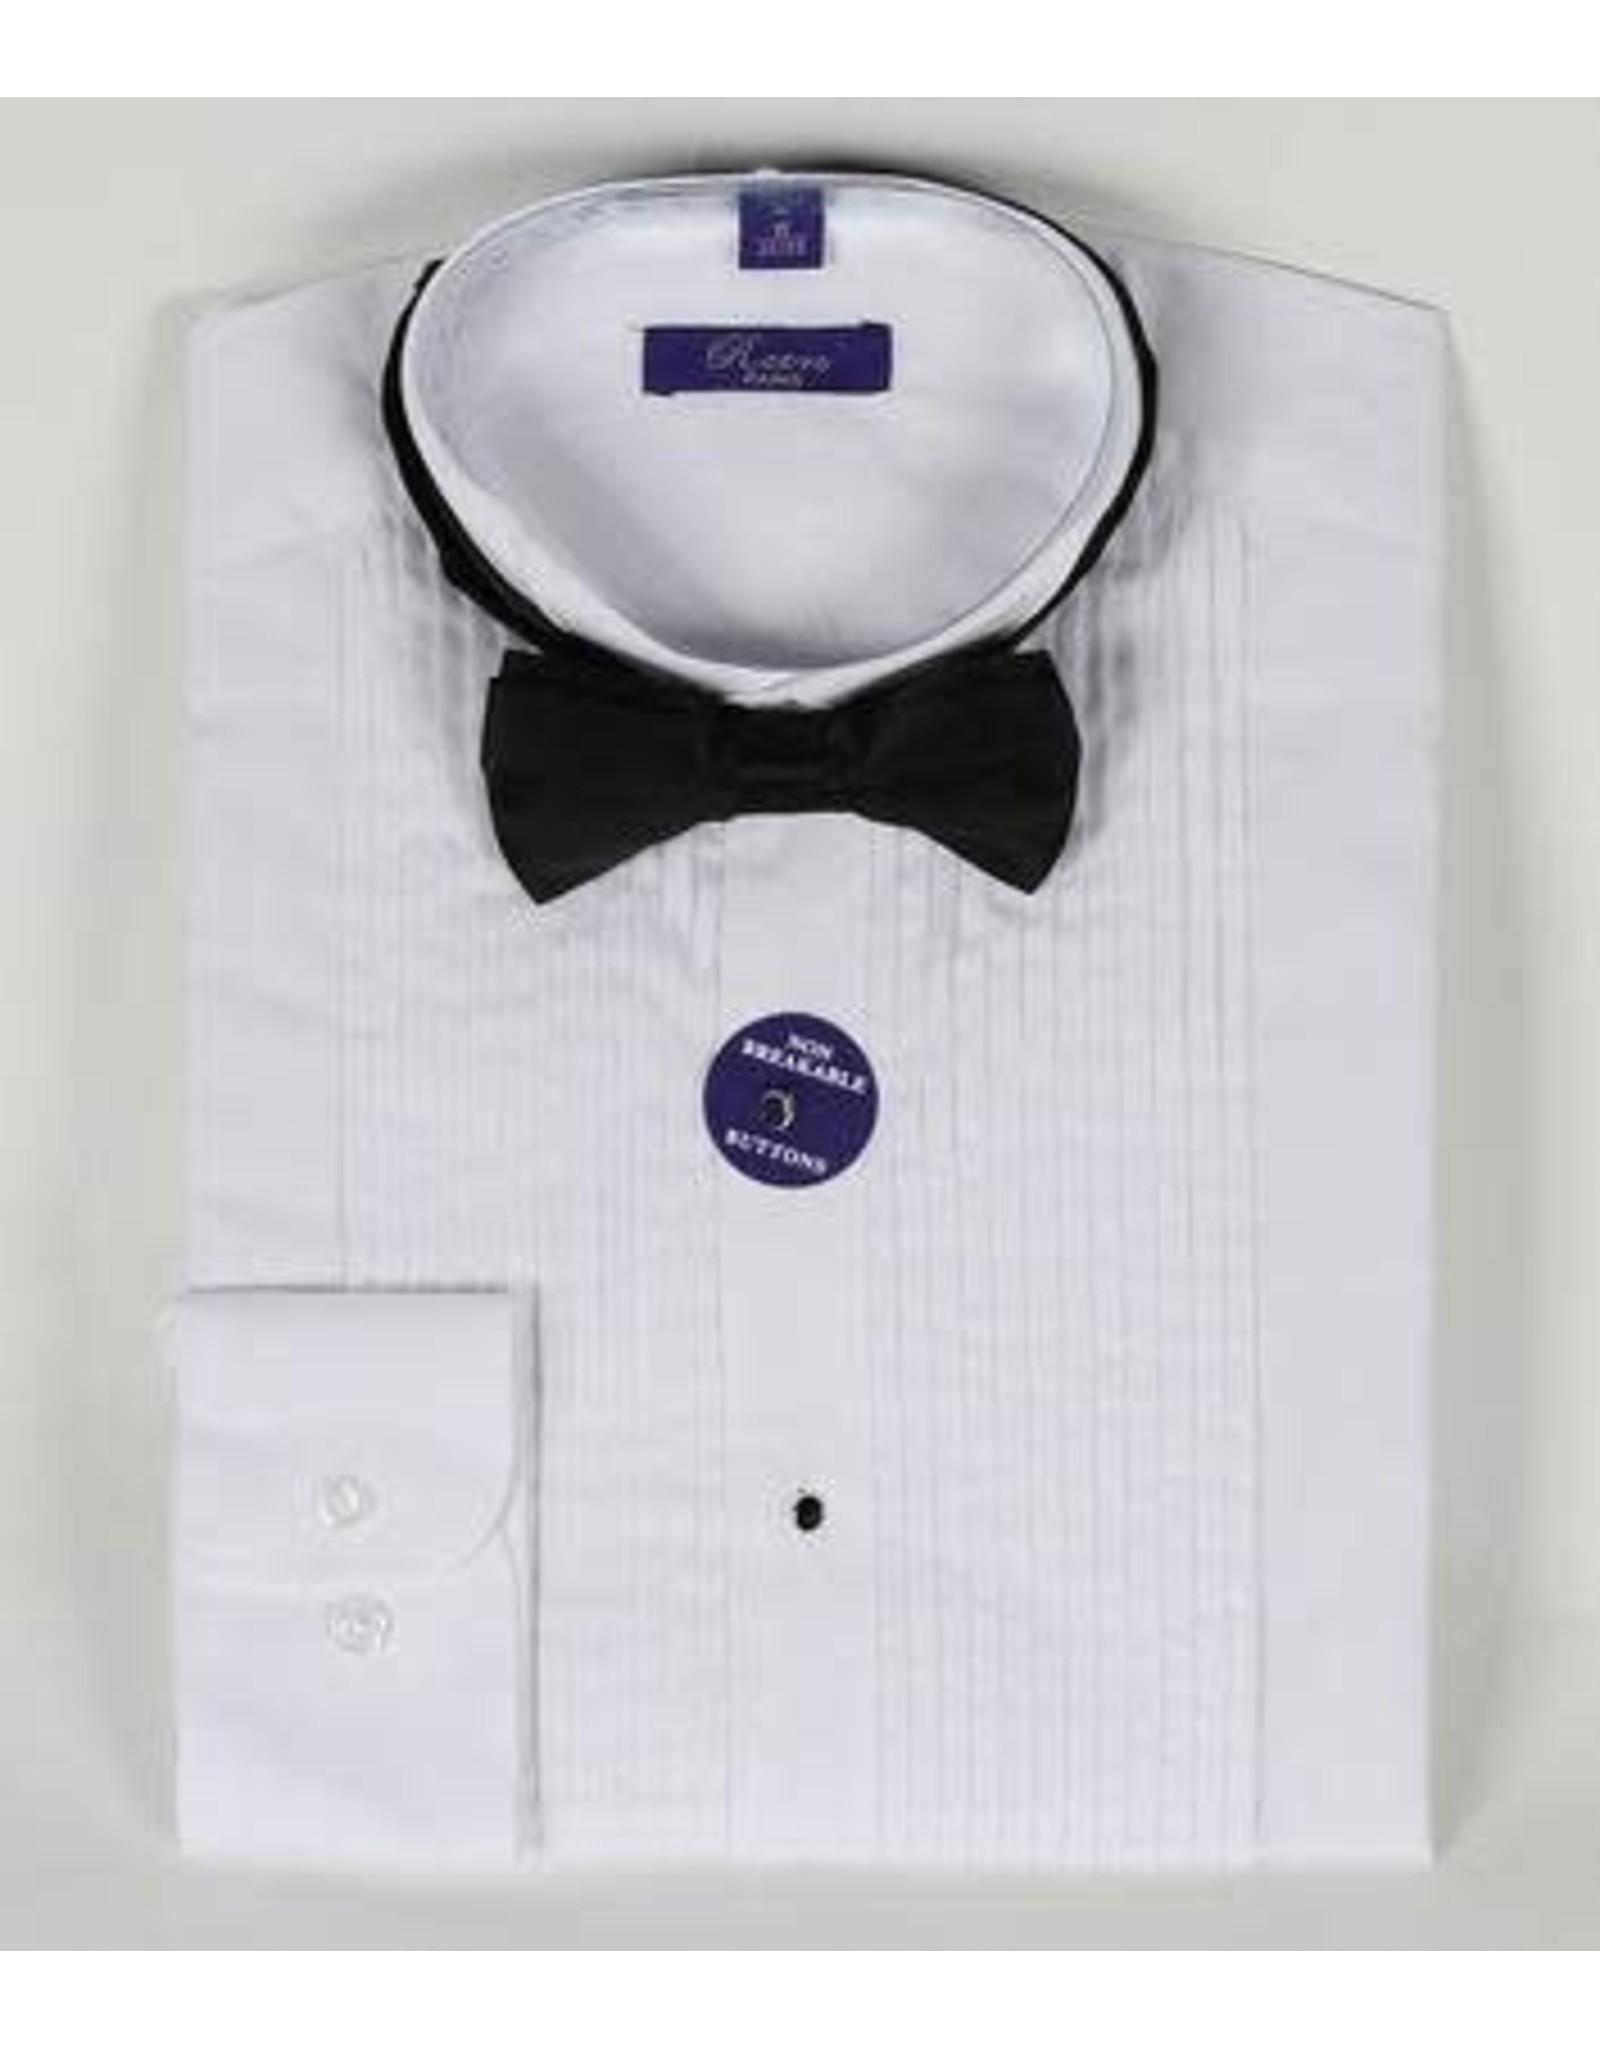 Daniel Ellissa Wing Collar Tuxedo Shirt & Bowtie - White